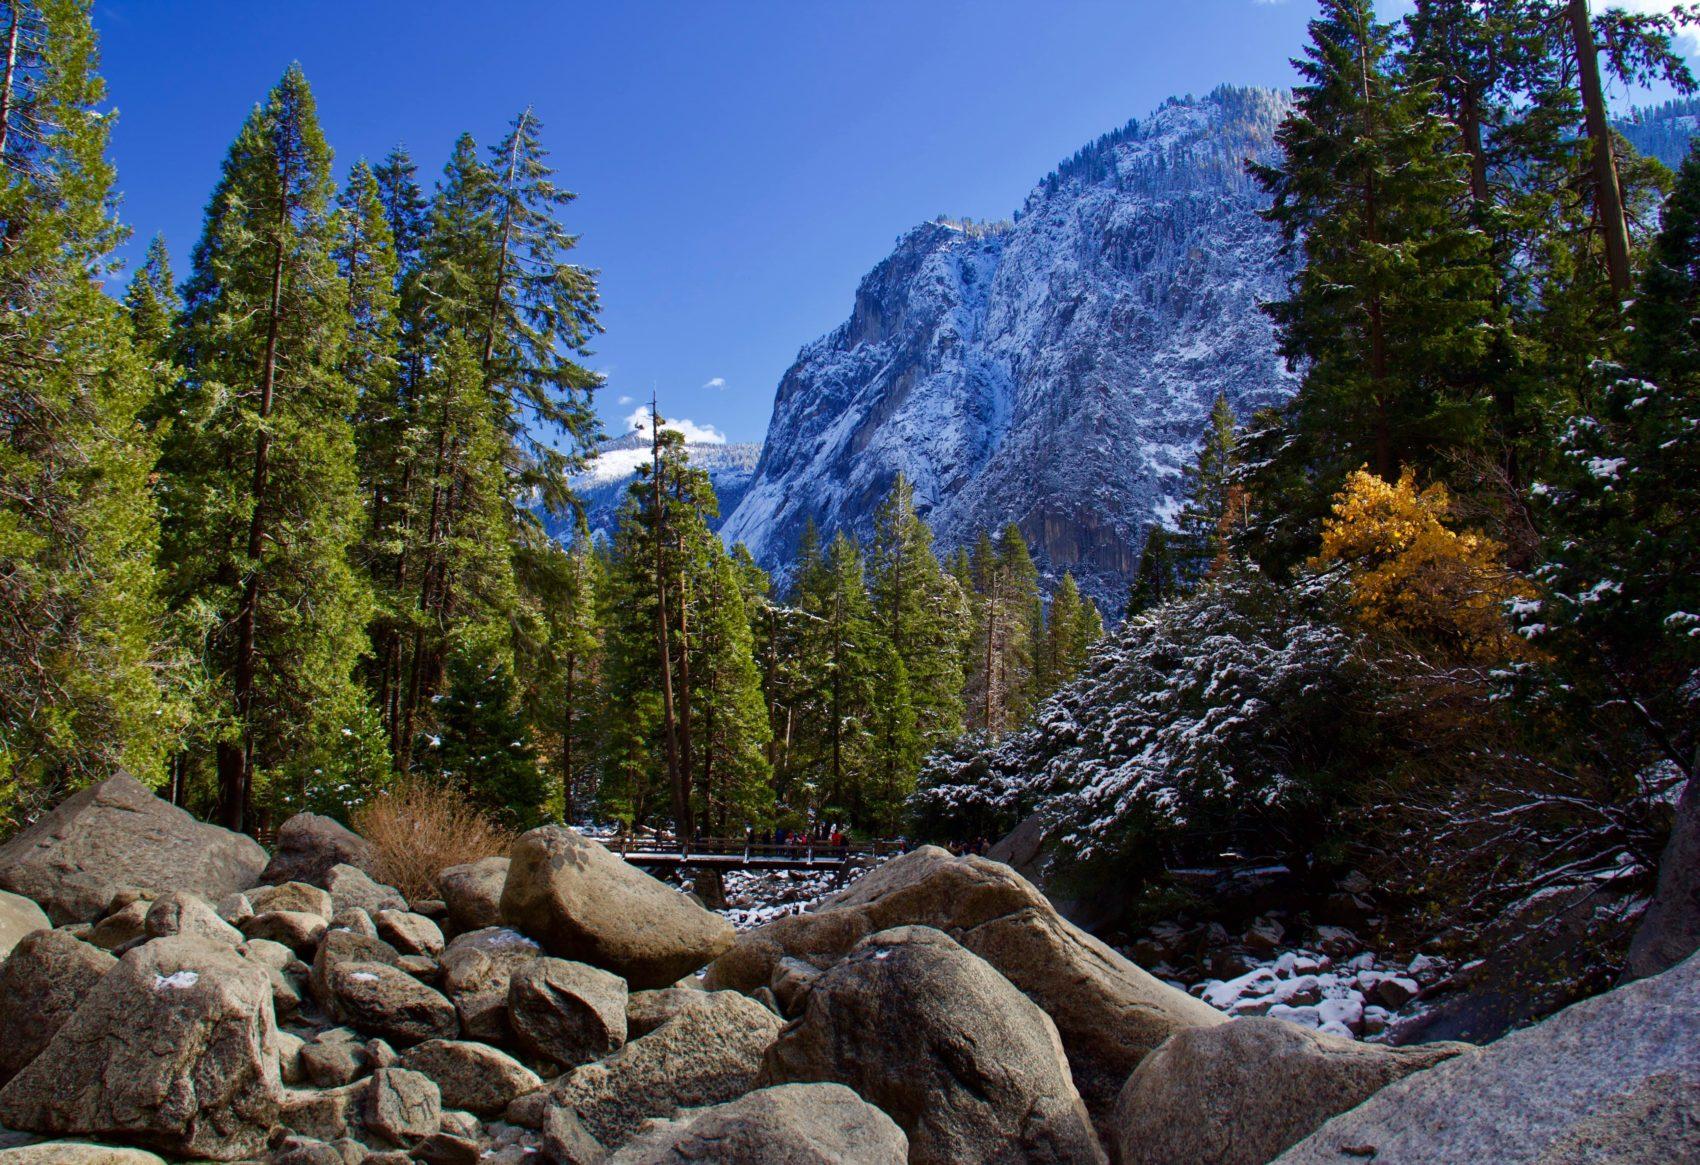 yosemite, national park, california, Yosemite valley